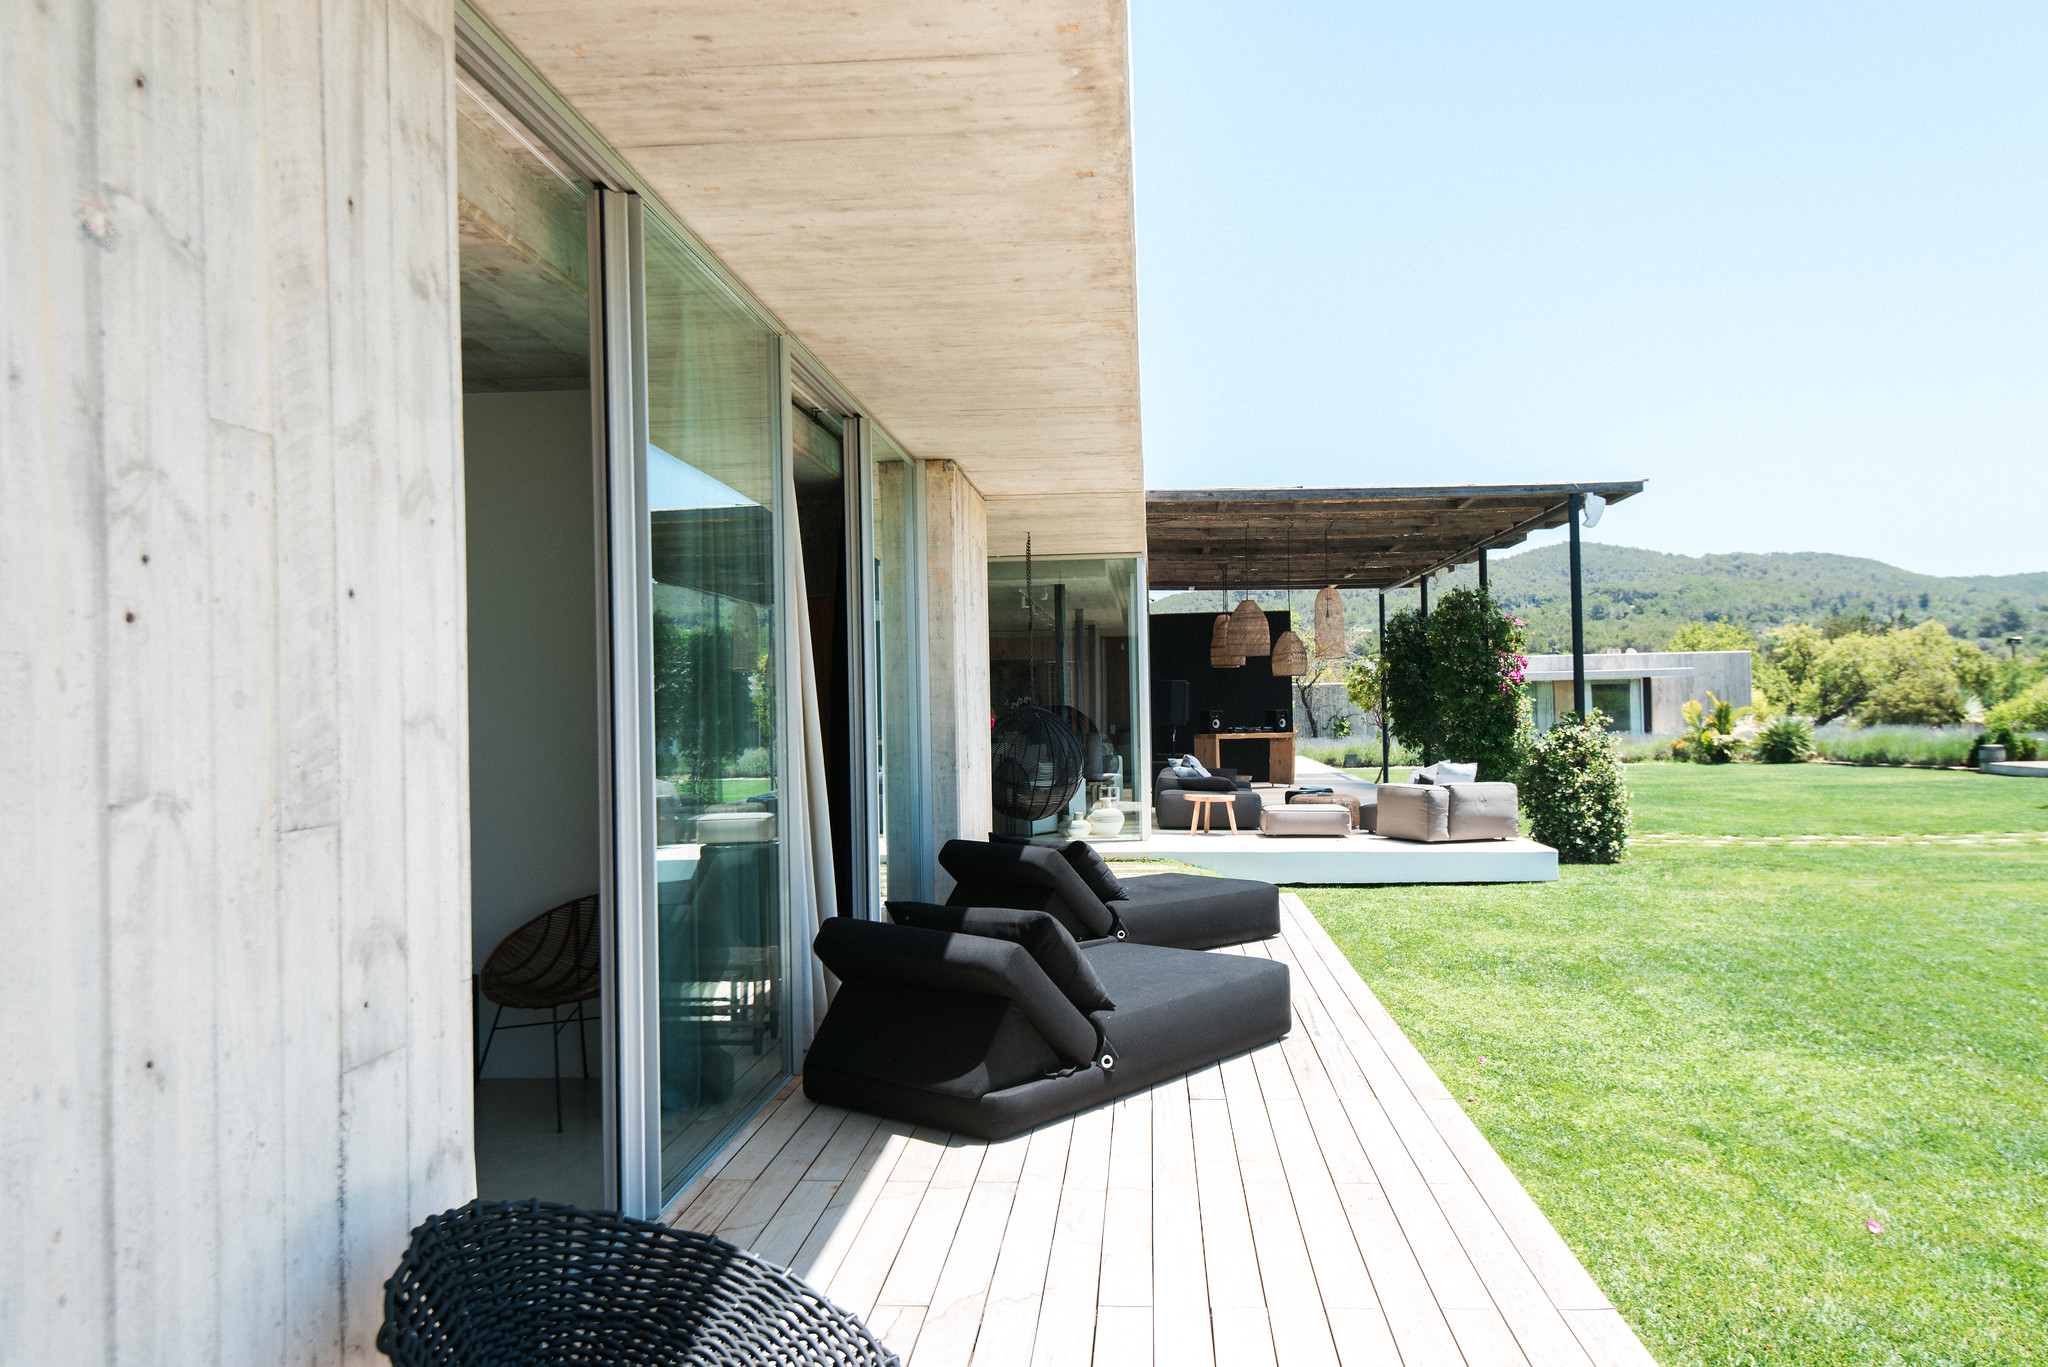 https://www.white-ibiza.com/wp-content/uploads/2020/06/white-ibiza-villas-casa-valentina-exterior-side.jpg